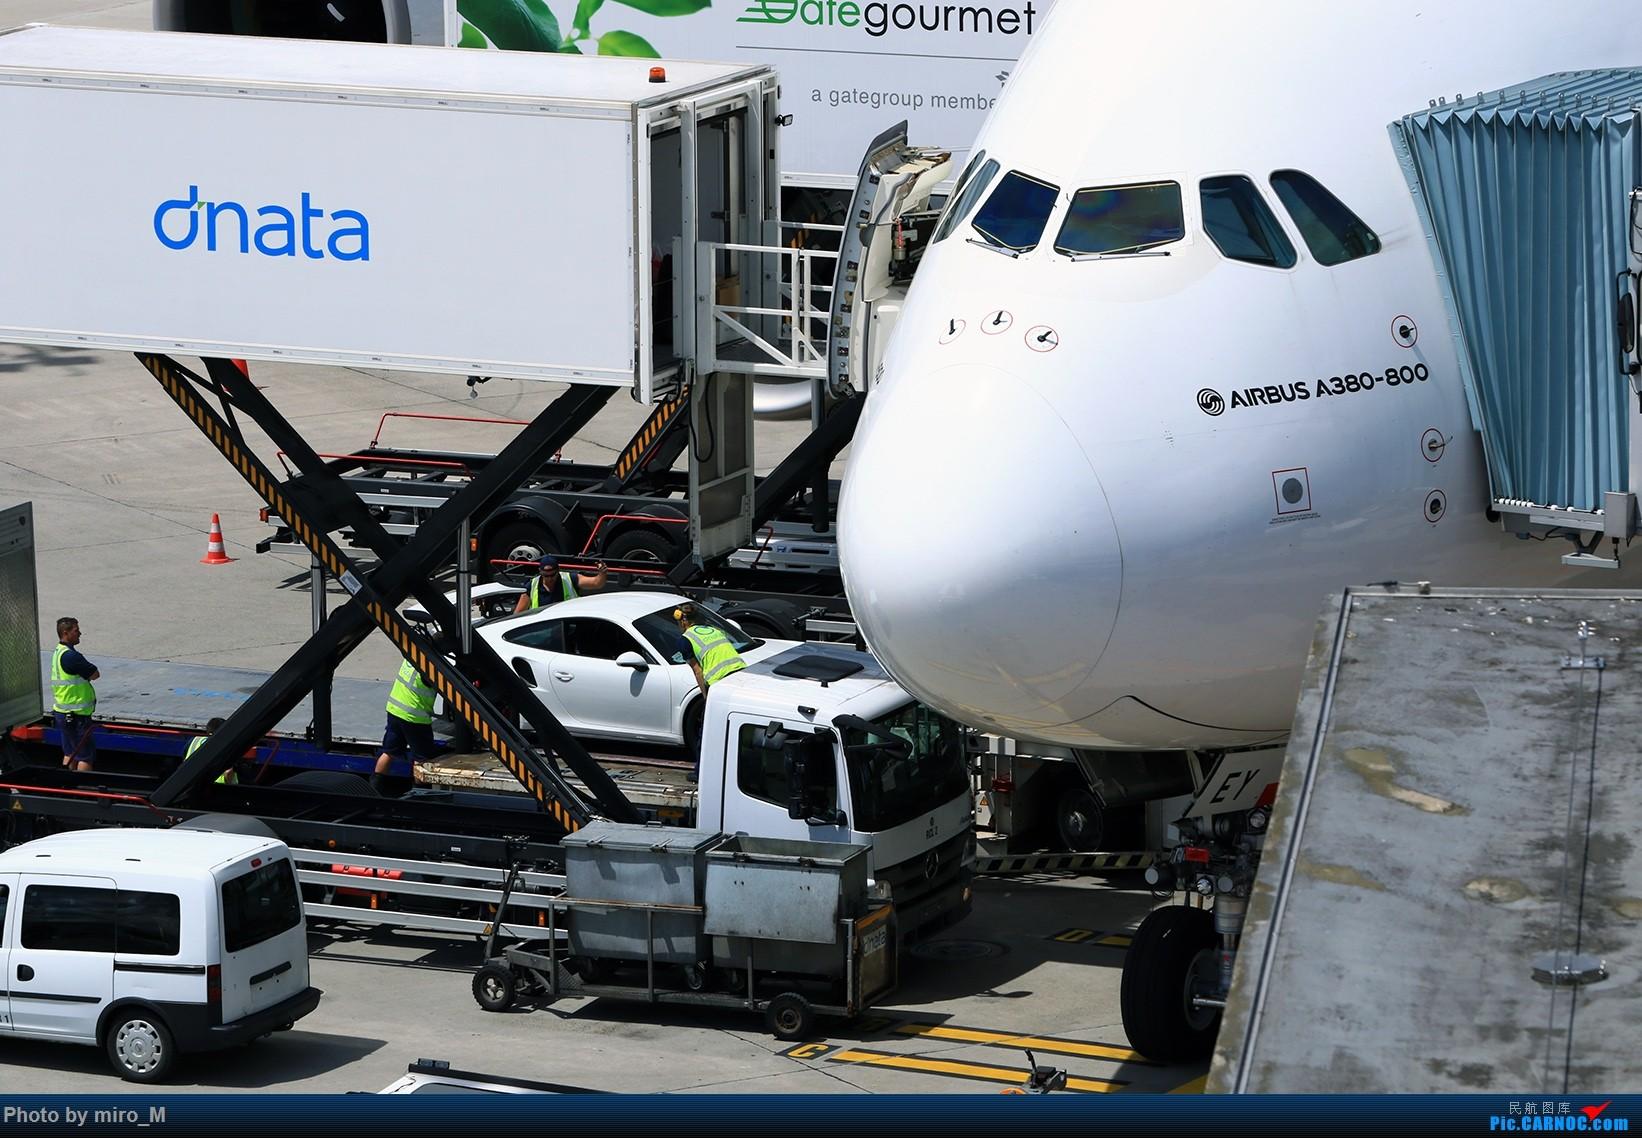 Re:[原创]欧洲浪了一圈,CS100,BAE146,fokker70等新老机型串着飞+ZRH,MUC,FRA,AMS,TLS拍机    瑞士苏黎世机场